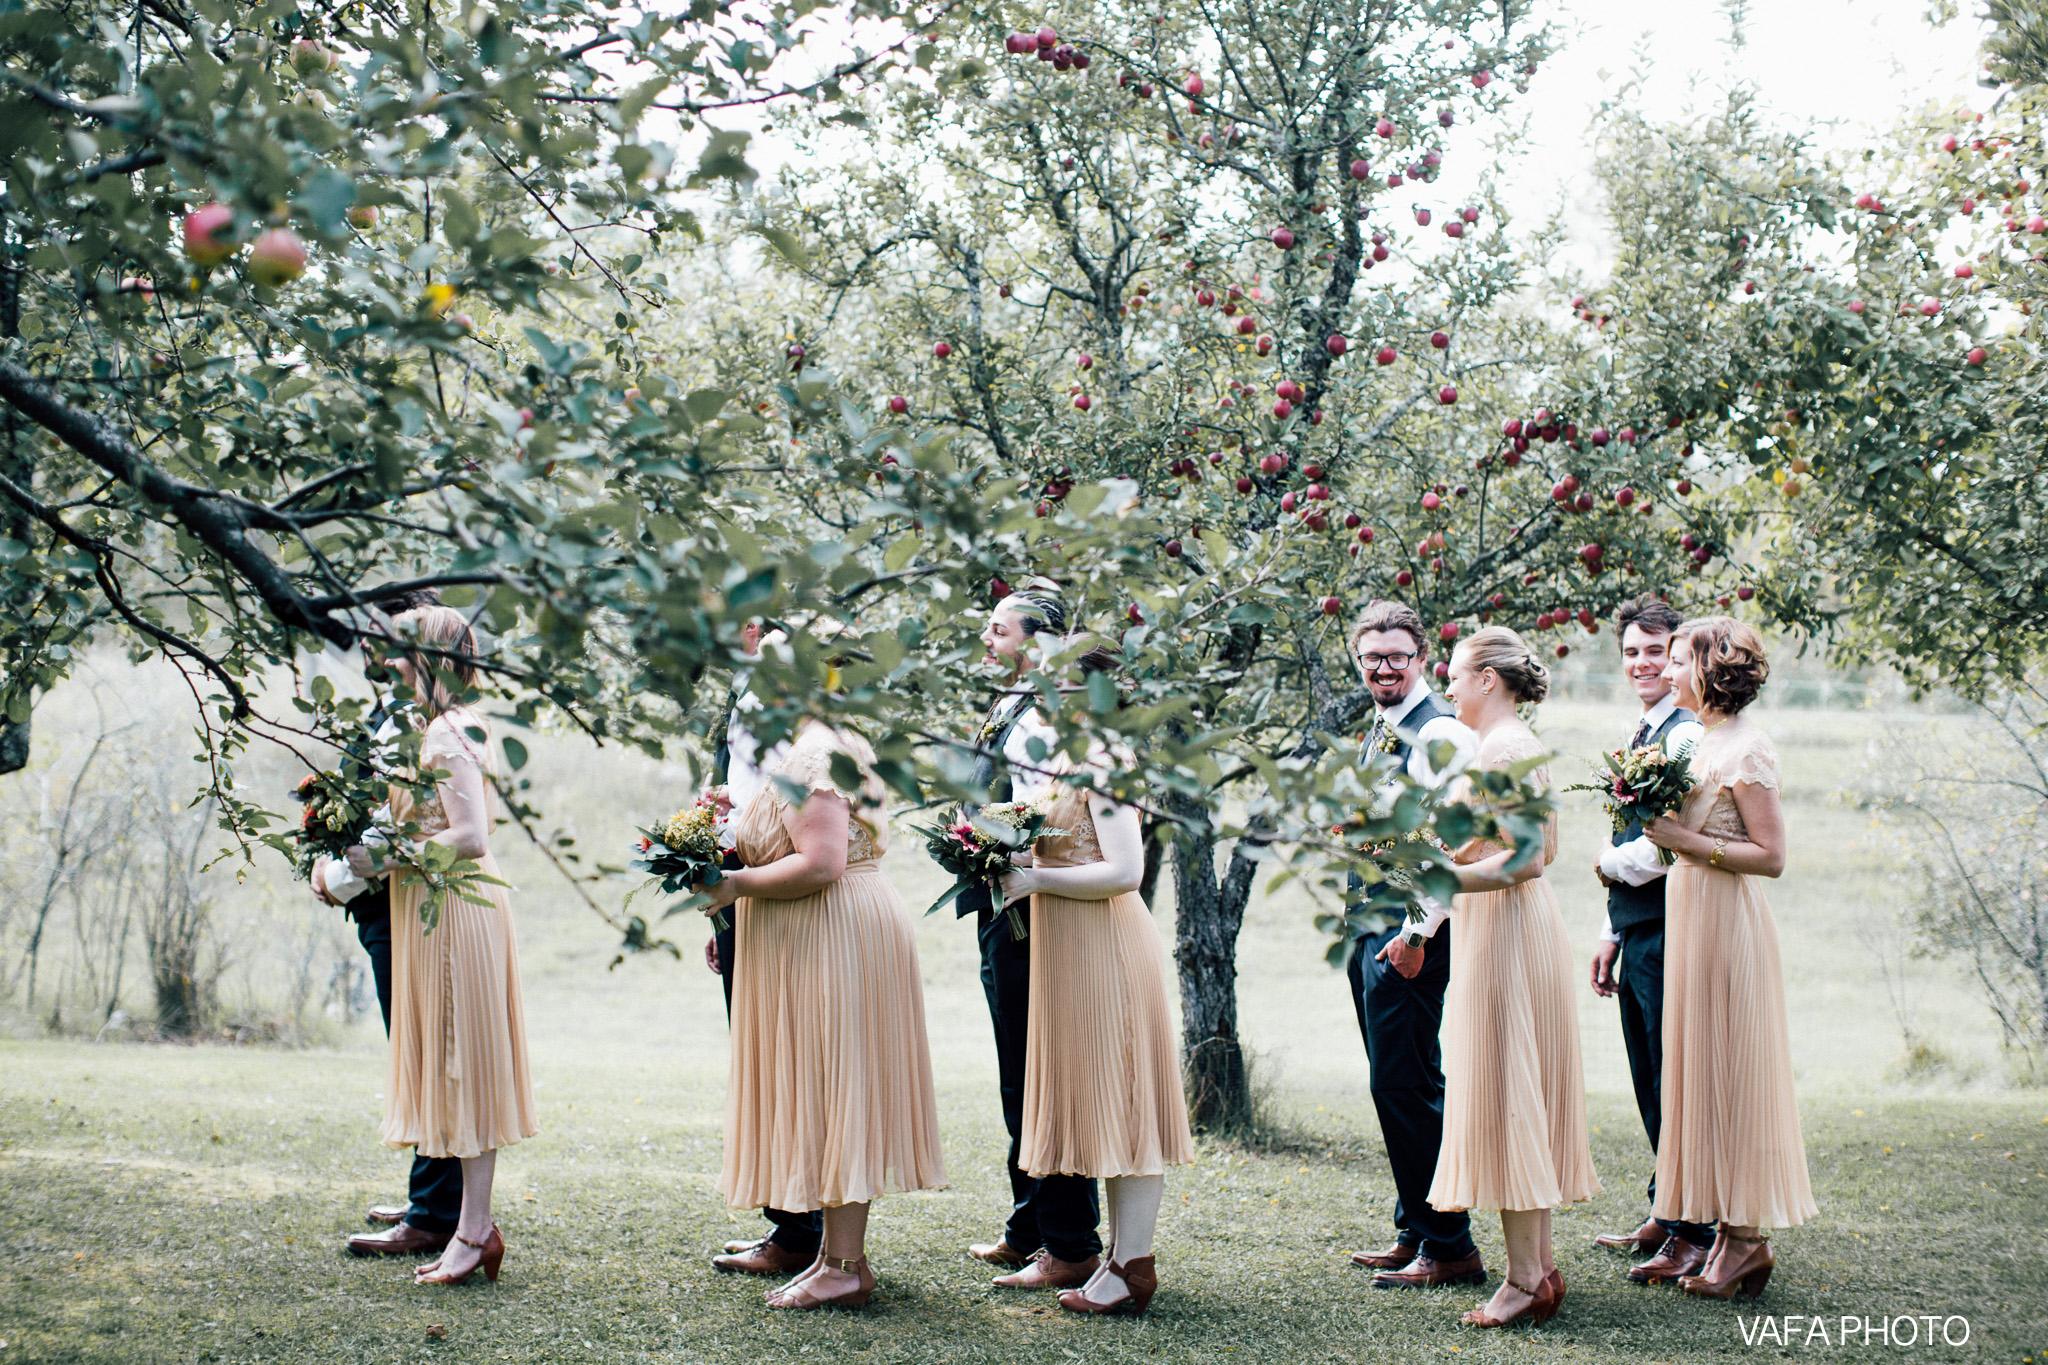 Belsolda-Farm-Wedding-Christy-Eric-Vafa-Photo-370.jpg